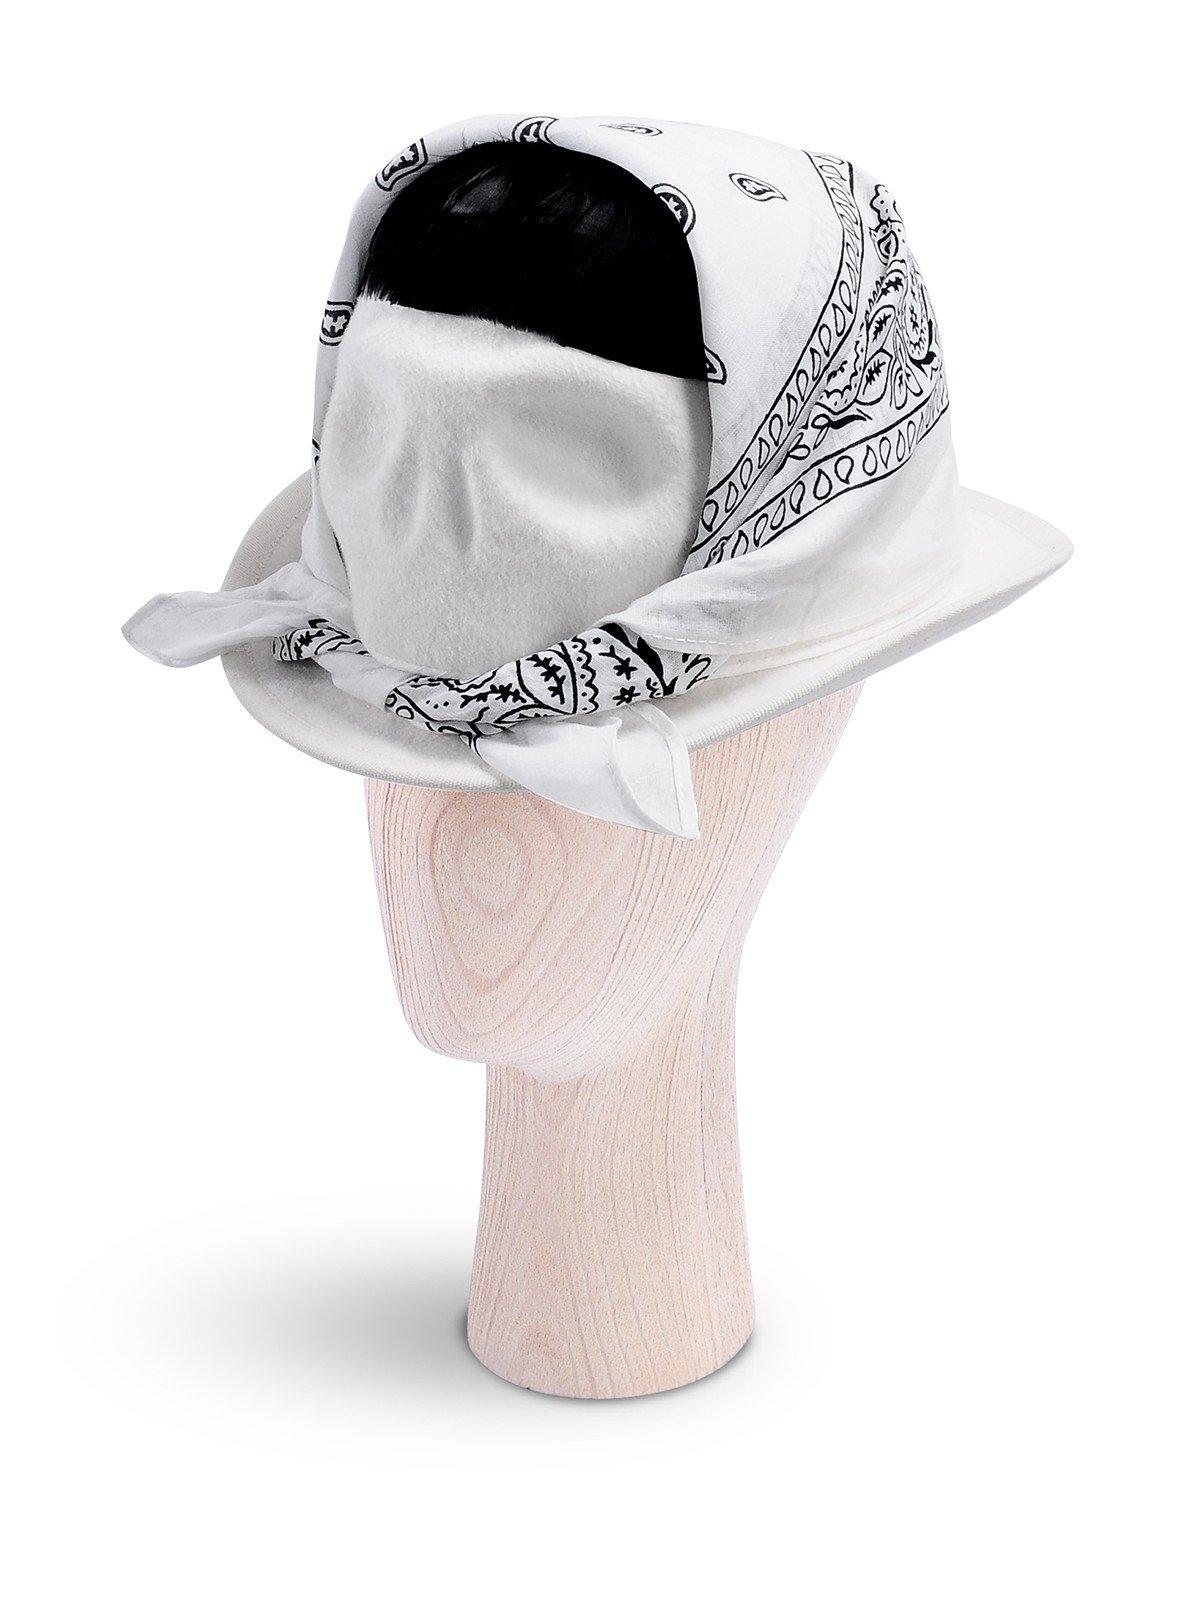 Skull With White Bandana